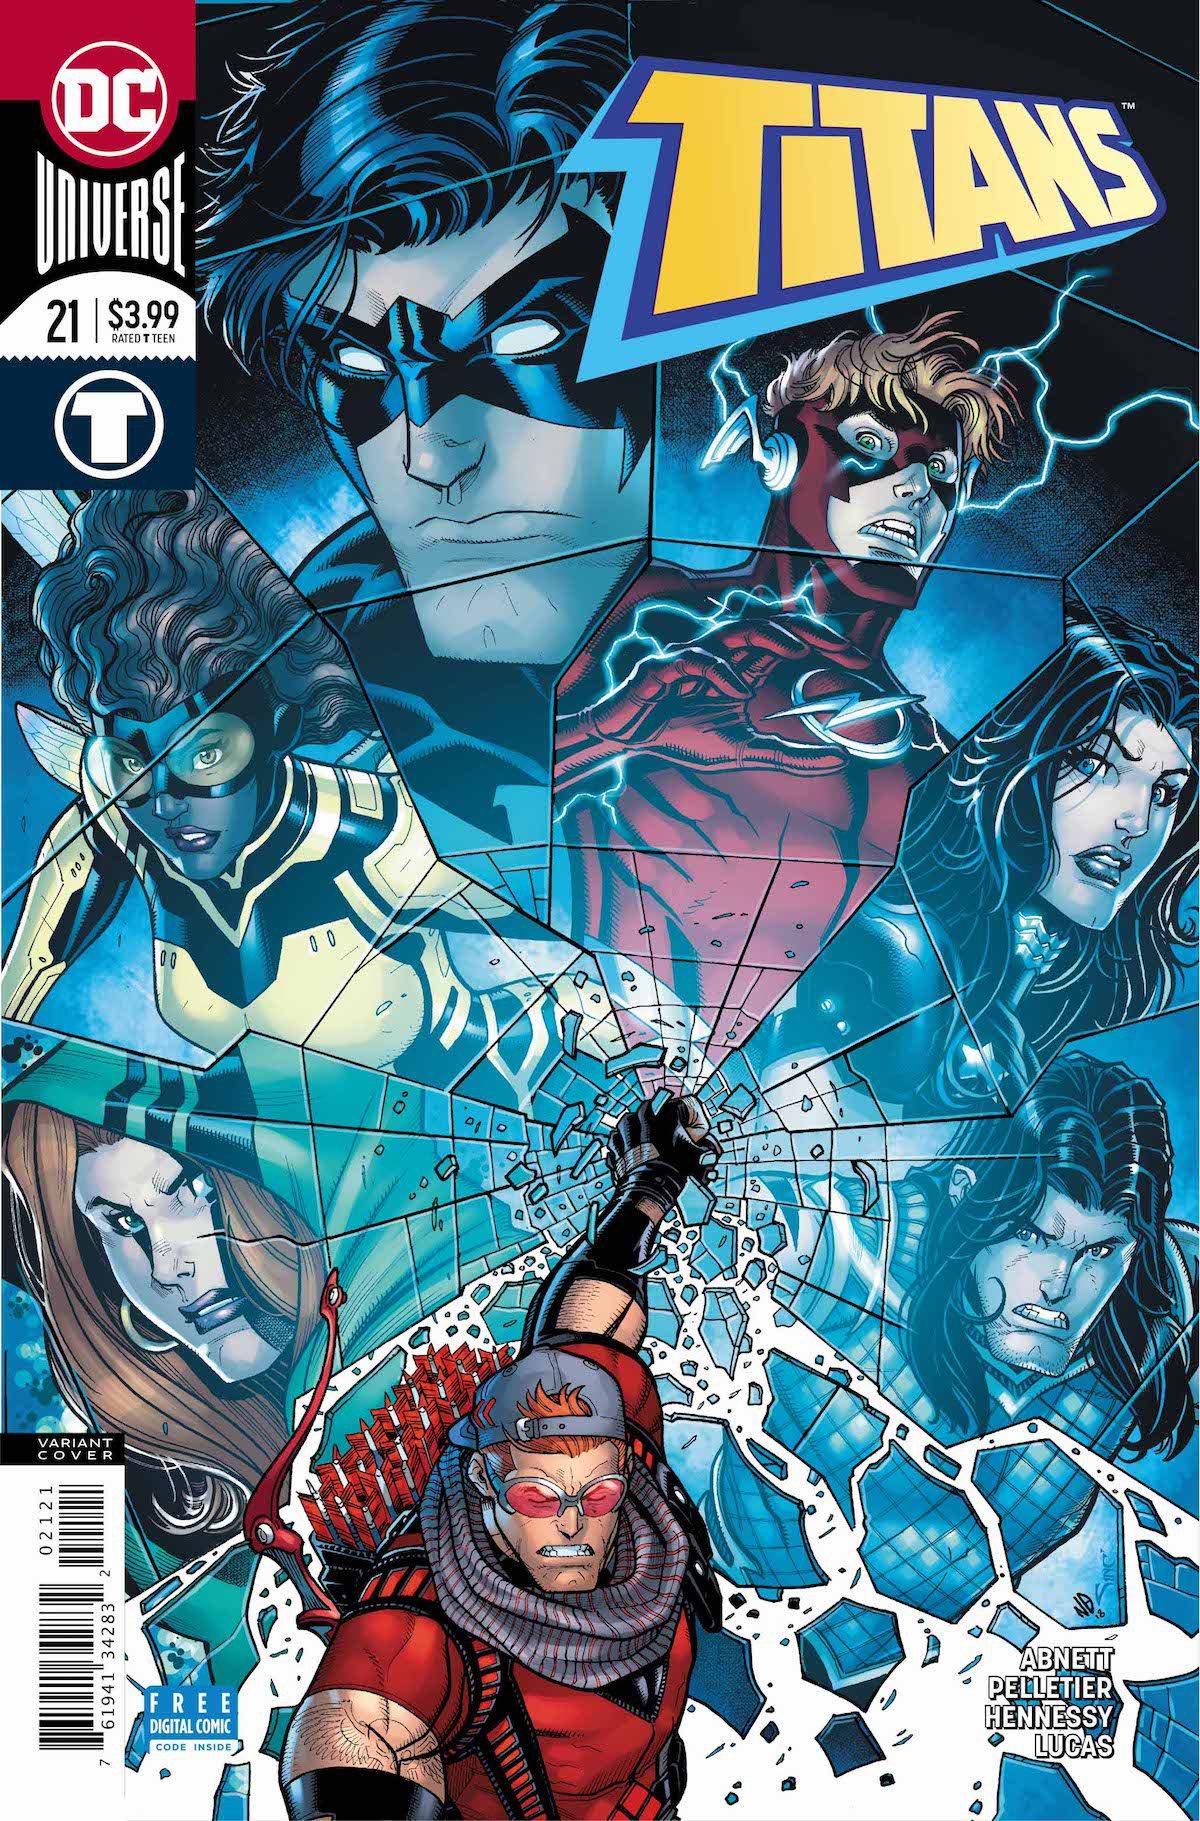 Titans #21 variant cover